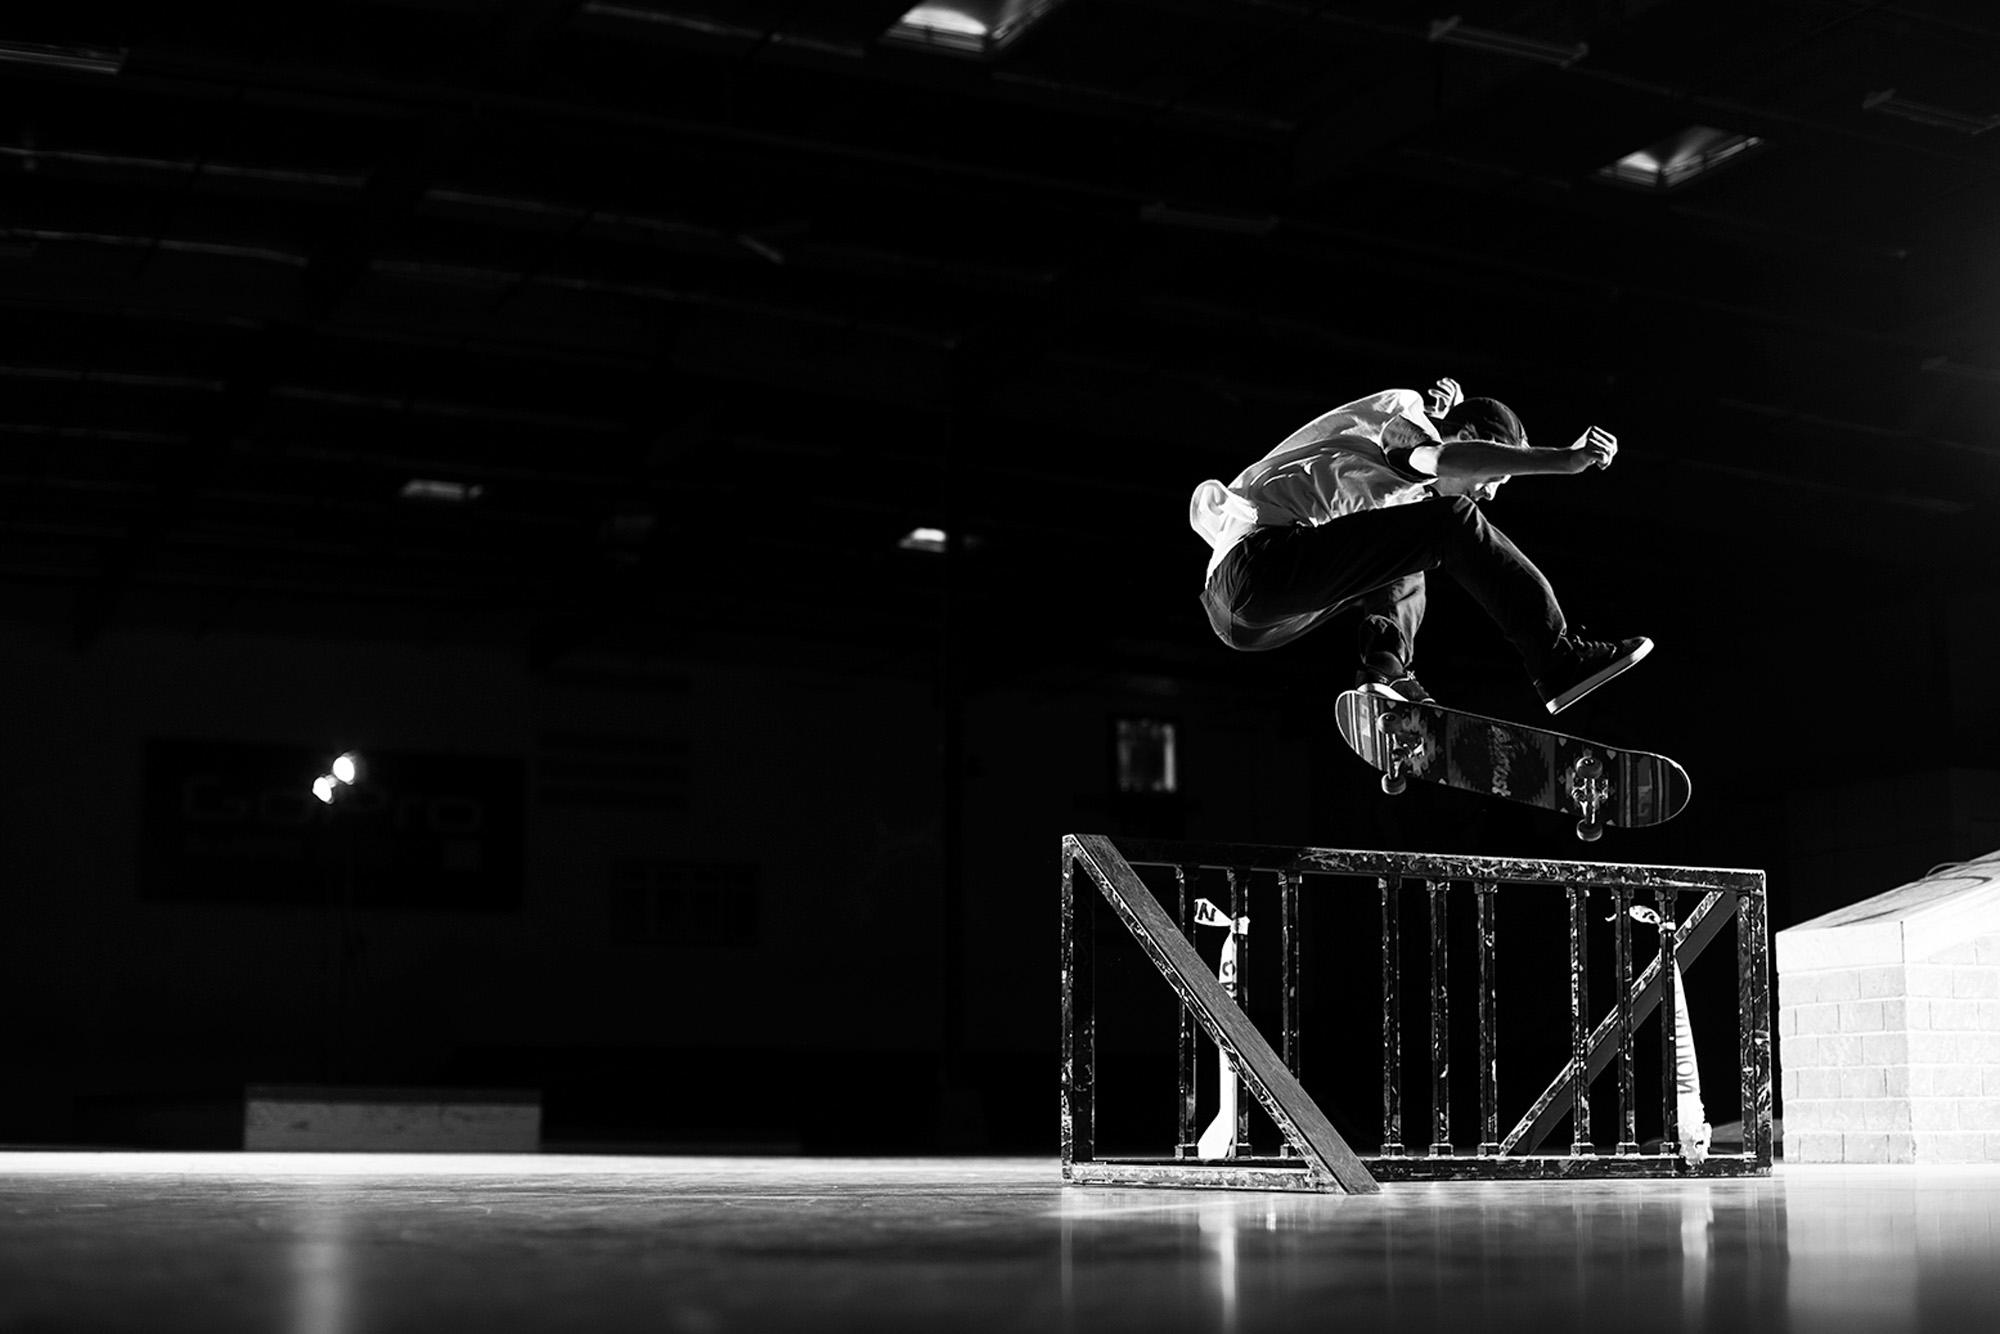 Tyson Bowerbank Almost Skateboards - The Berrics Recruit 5